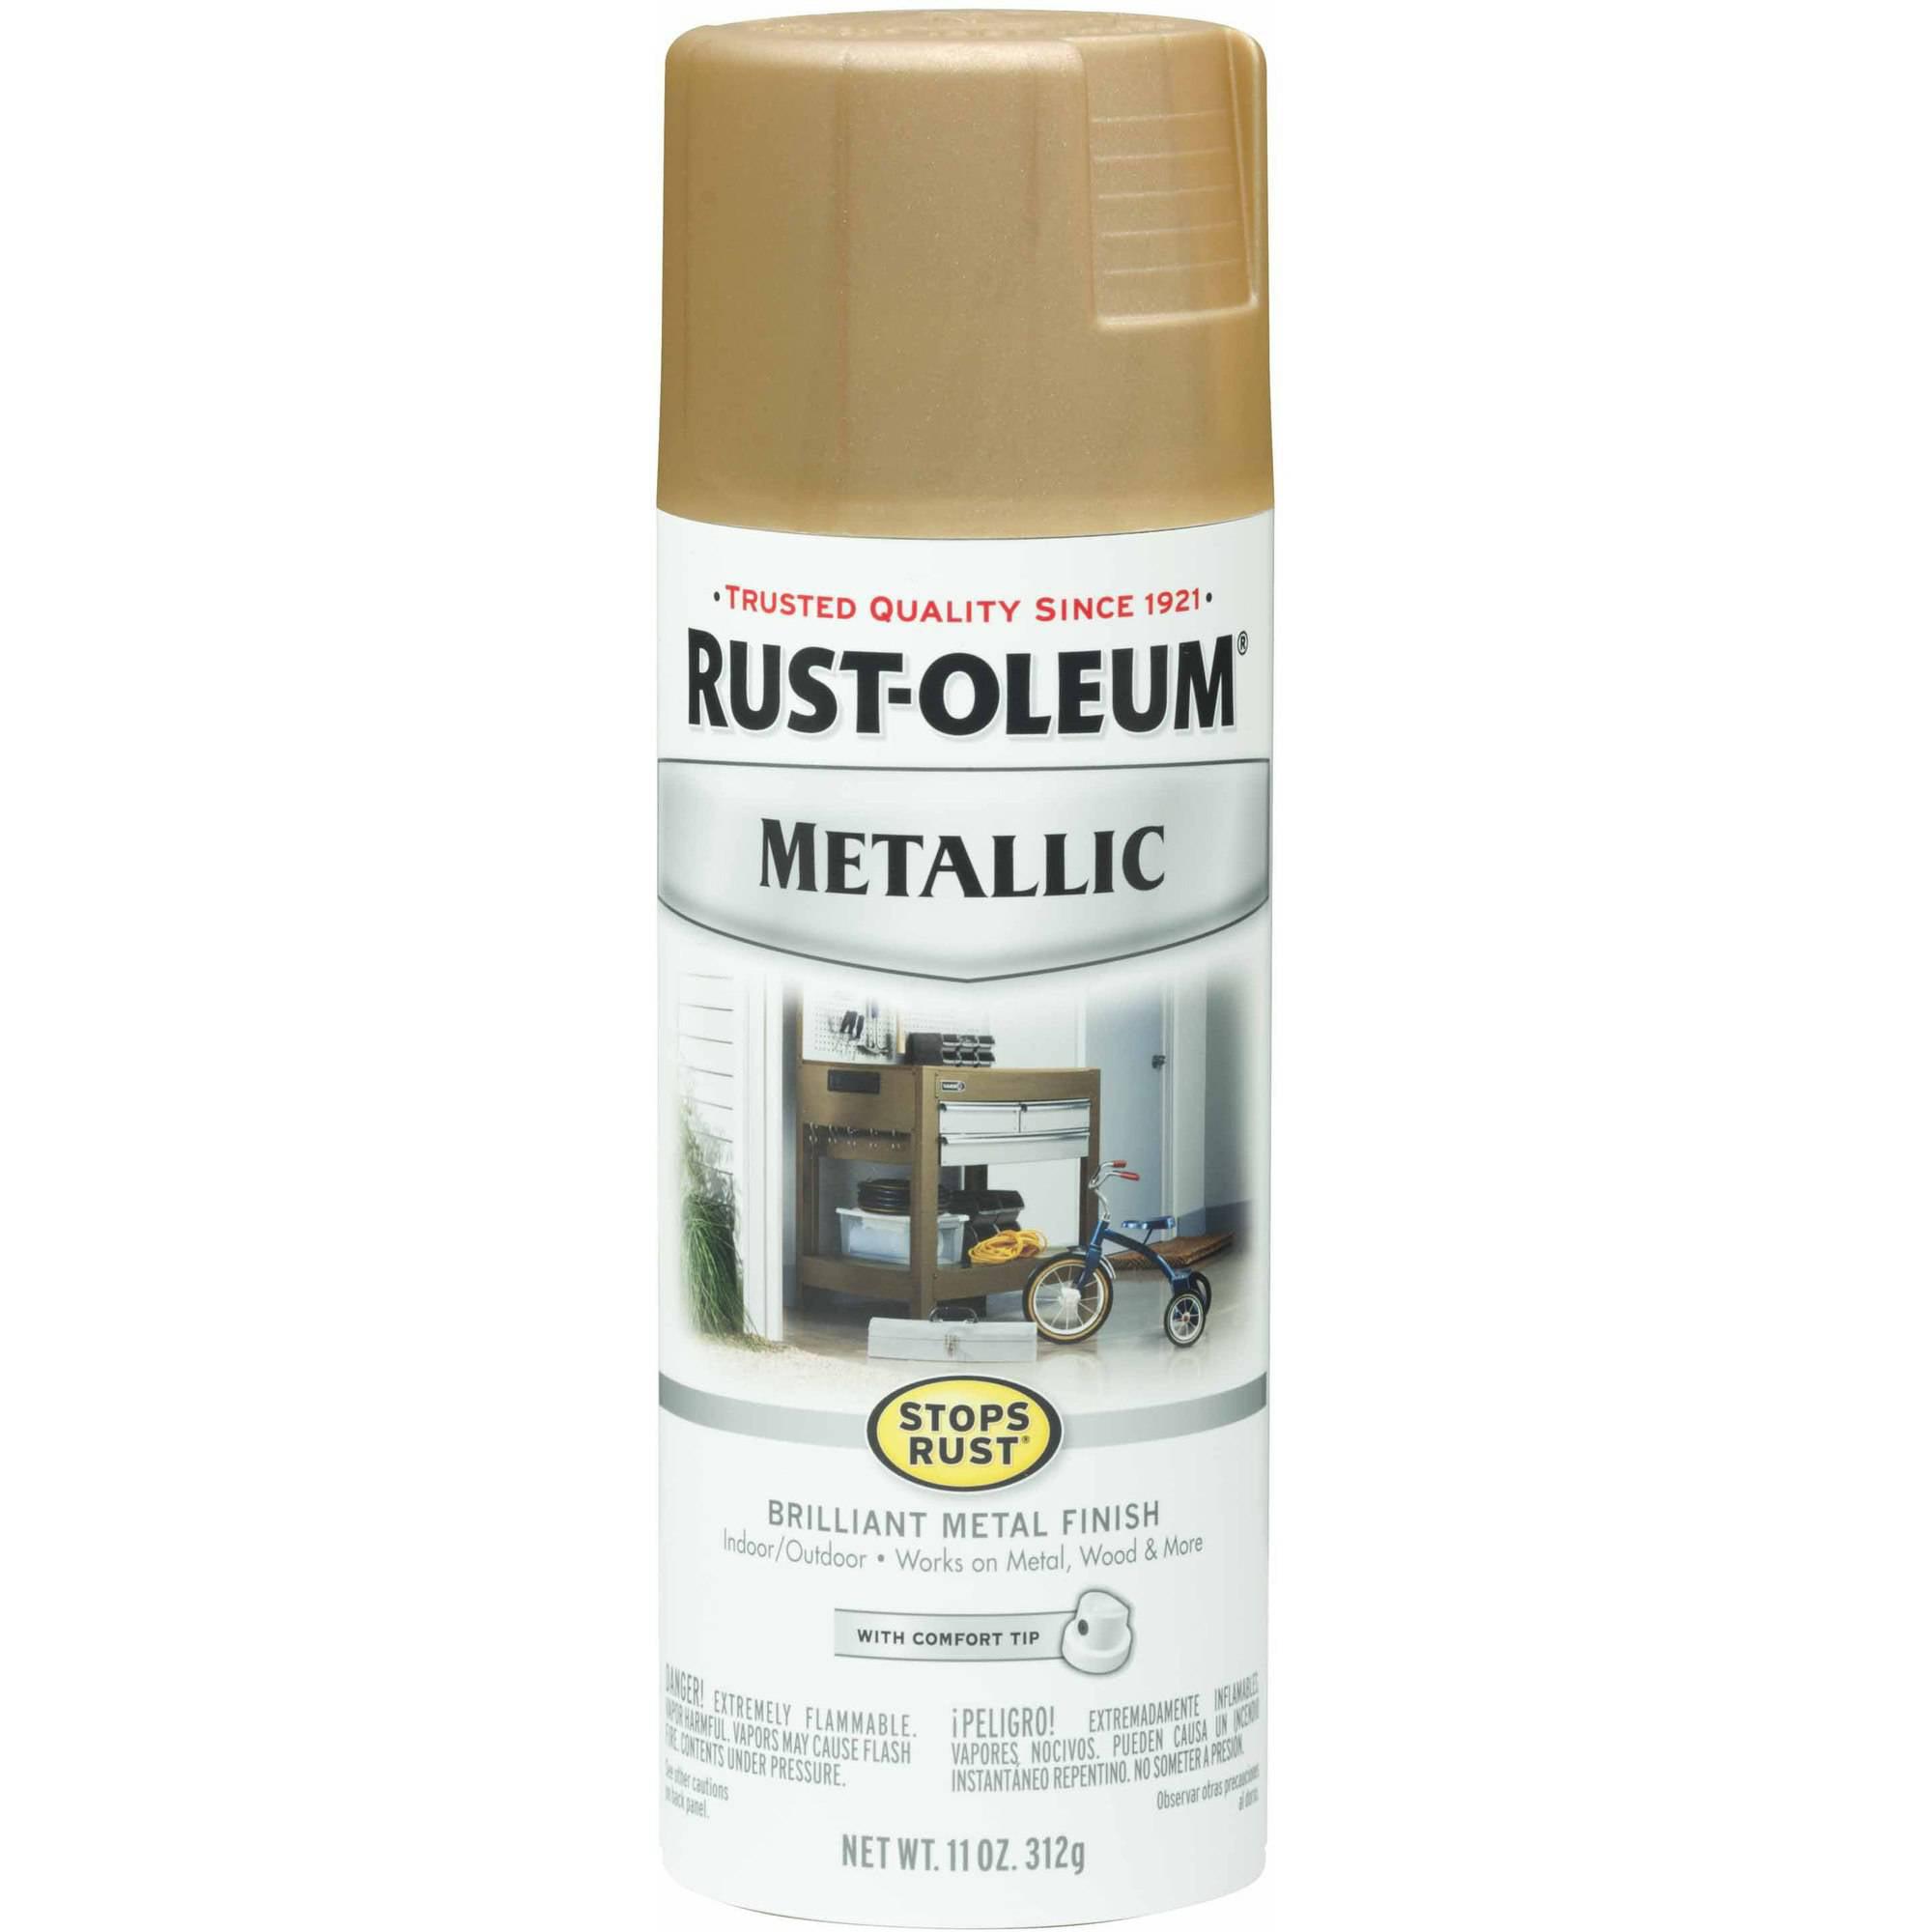 Rust-Oleum Stops Rust Vintage Metallic Spray Paint, Warm Gold